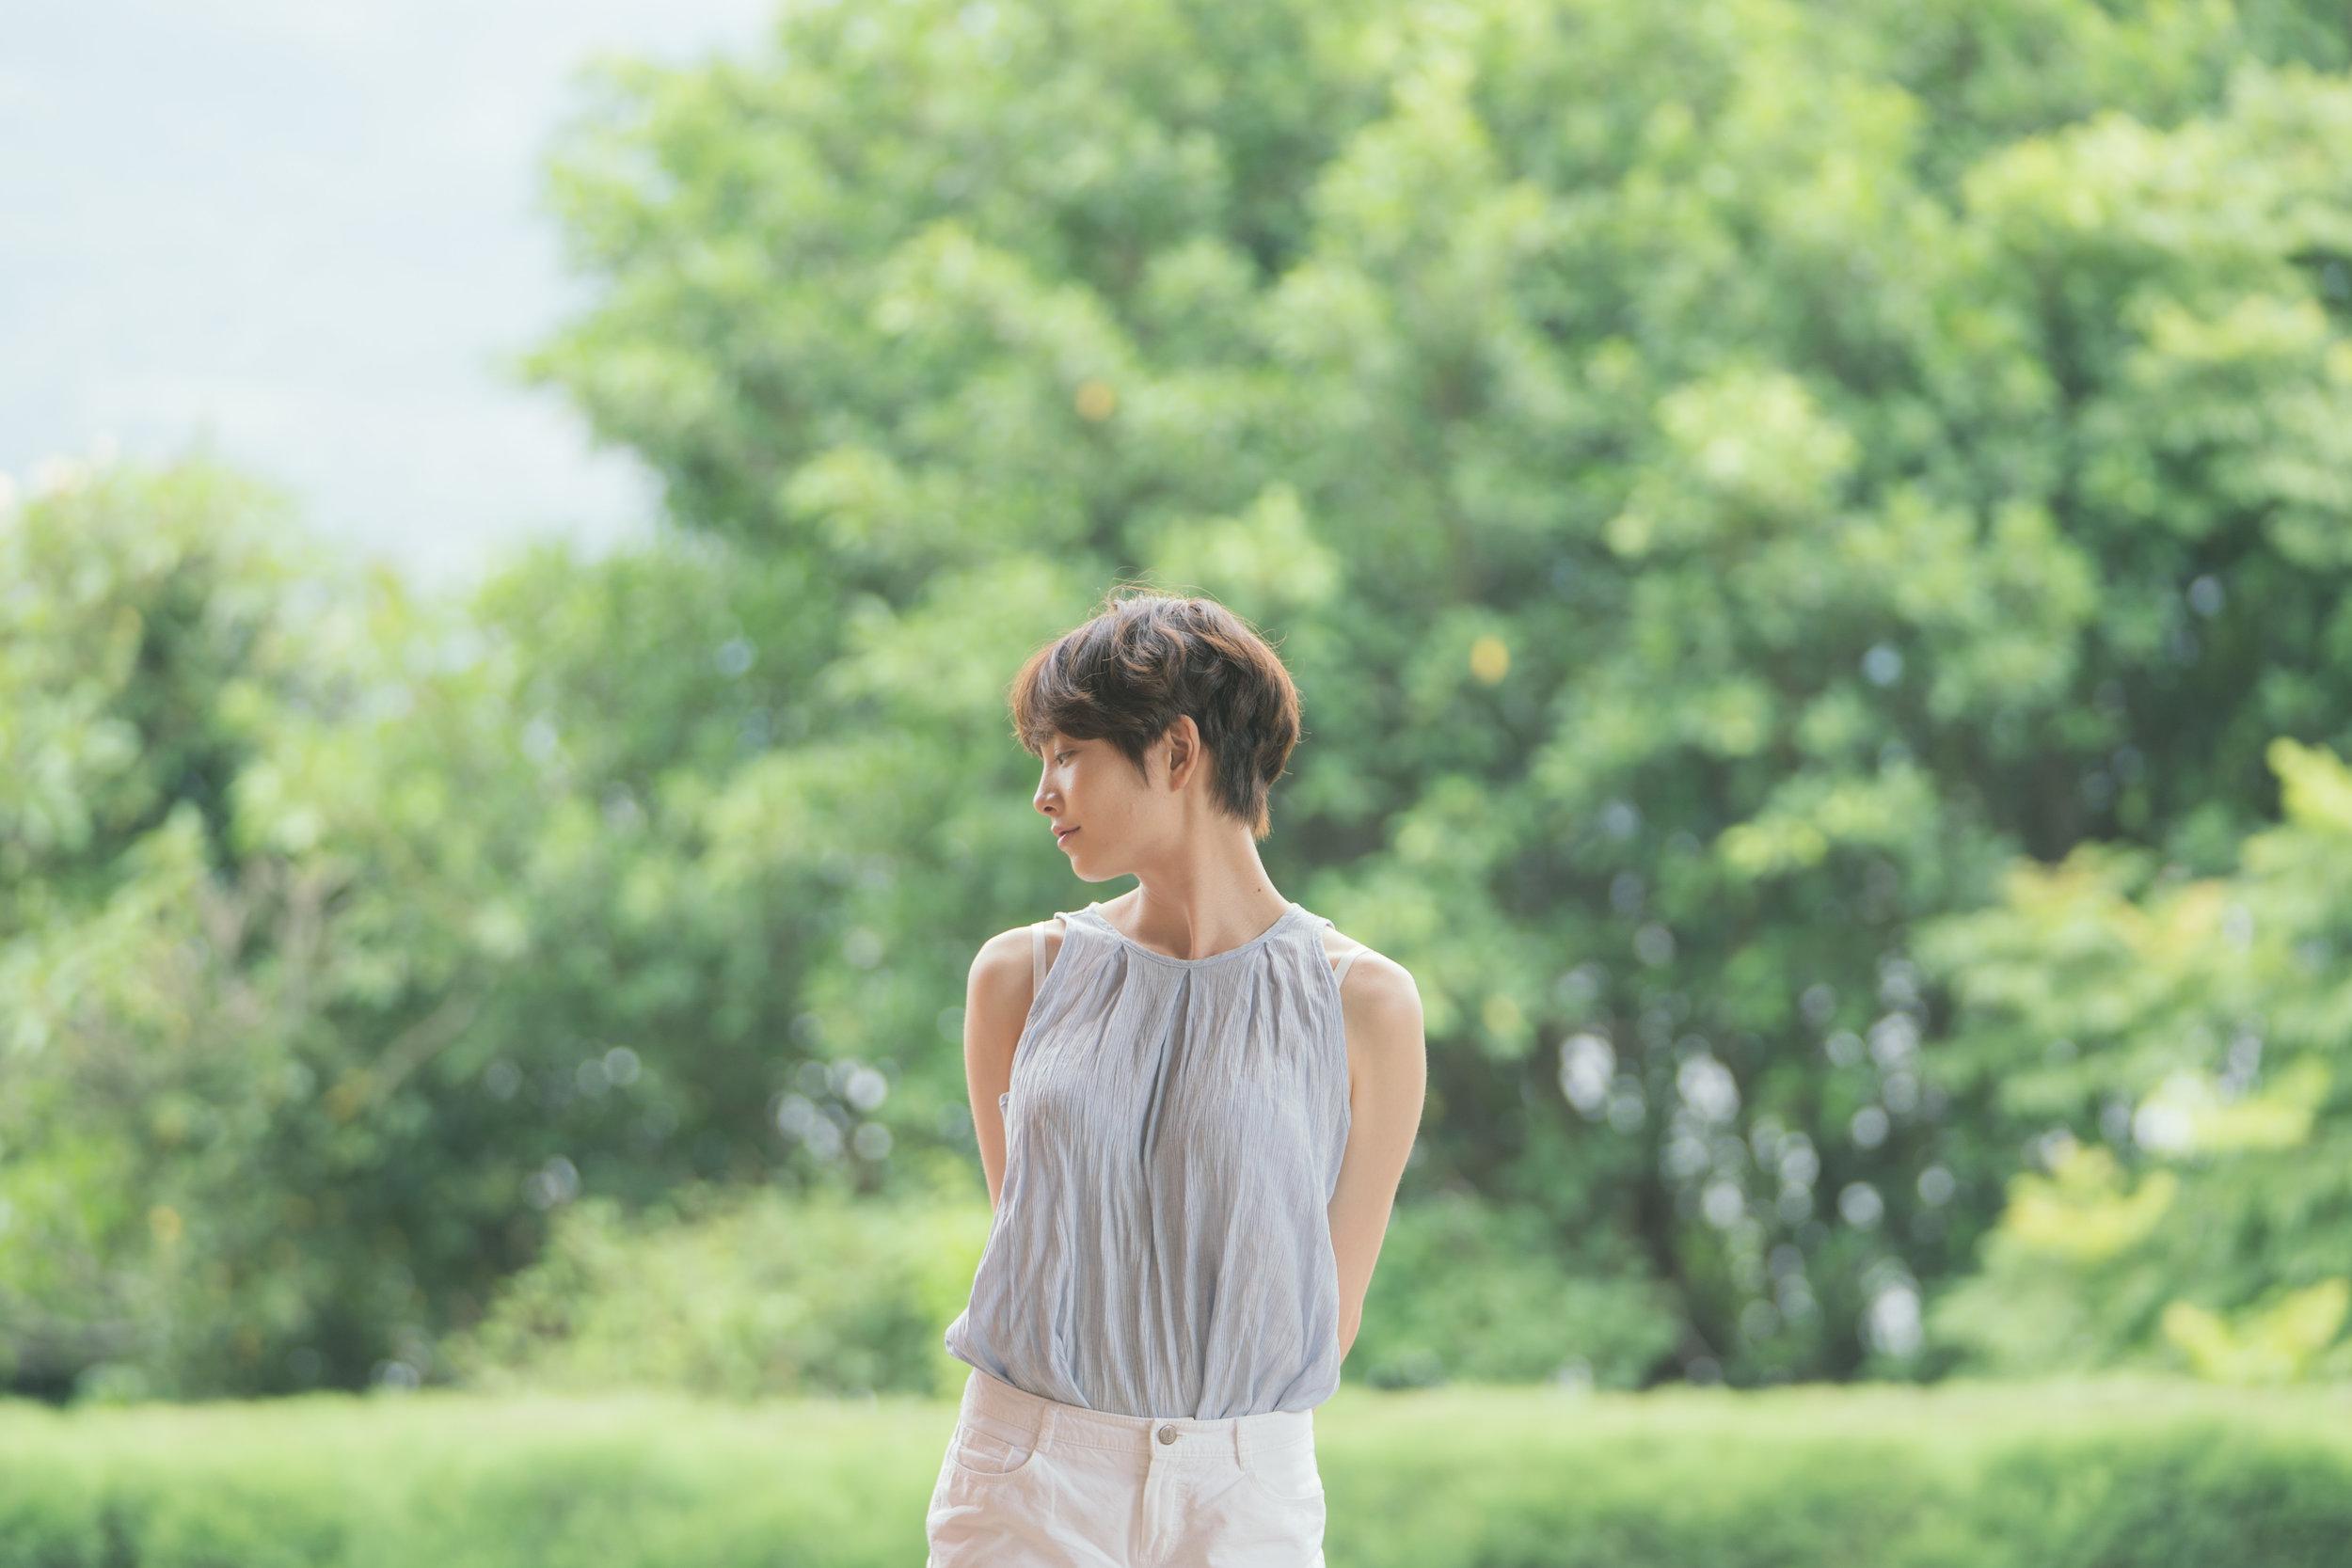 Sprazzi_Professional_Photography_Photographer_Seoul_Korea_Sion_Original_59.jpg